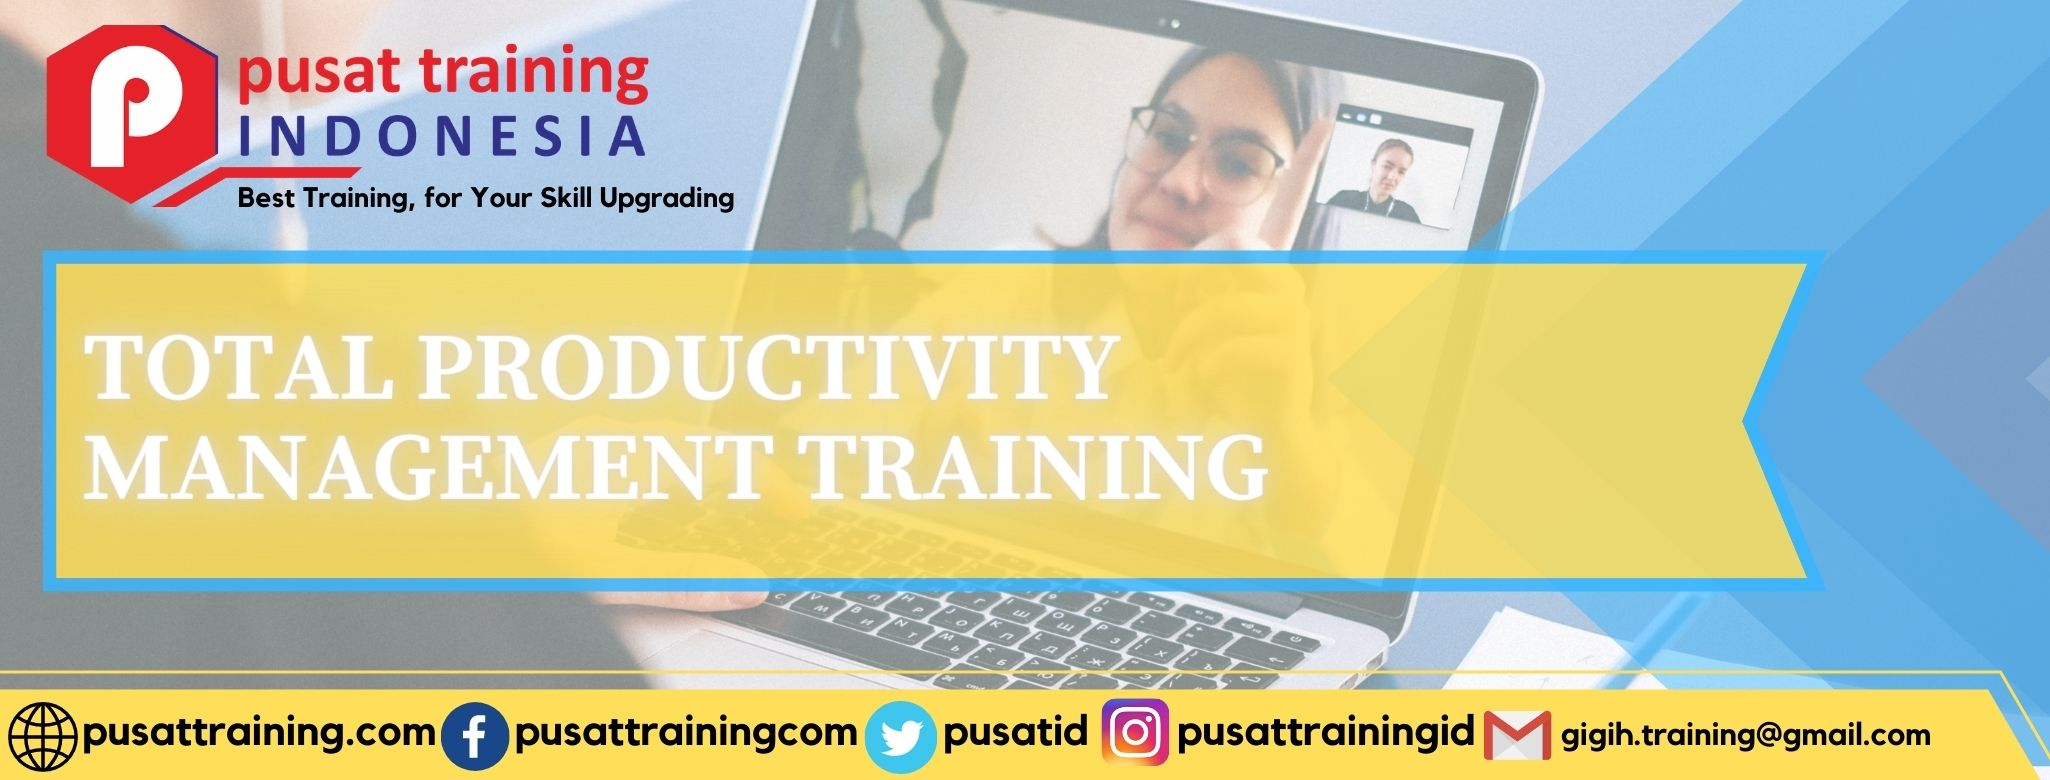 total-productivity-management-training